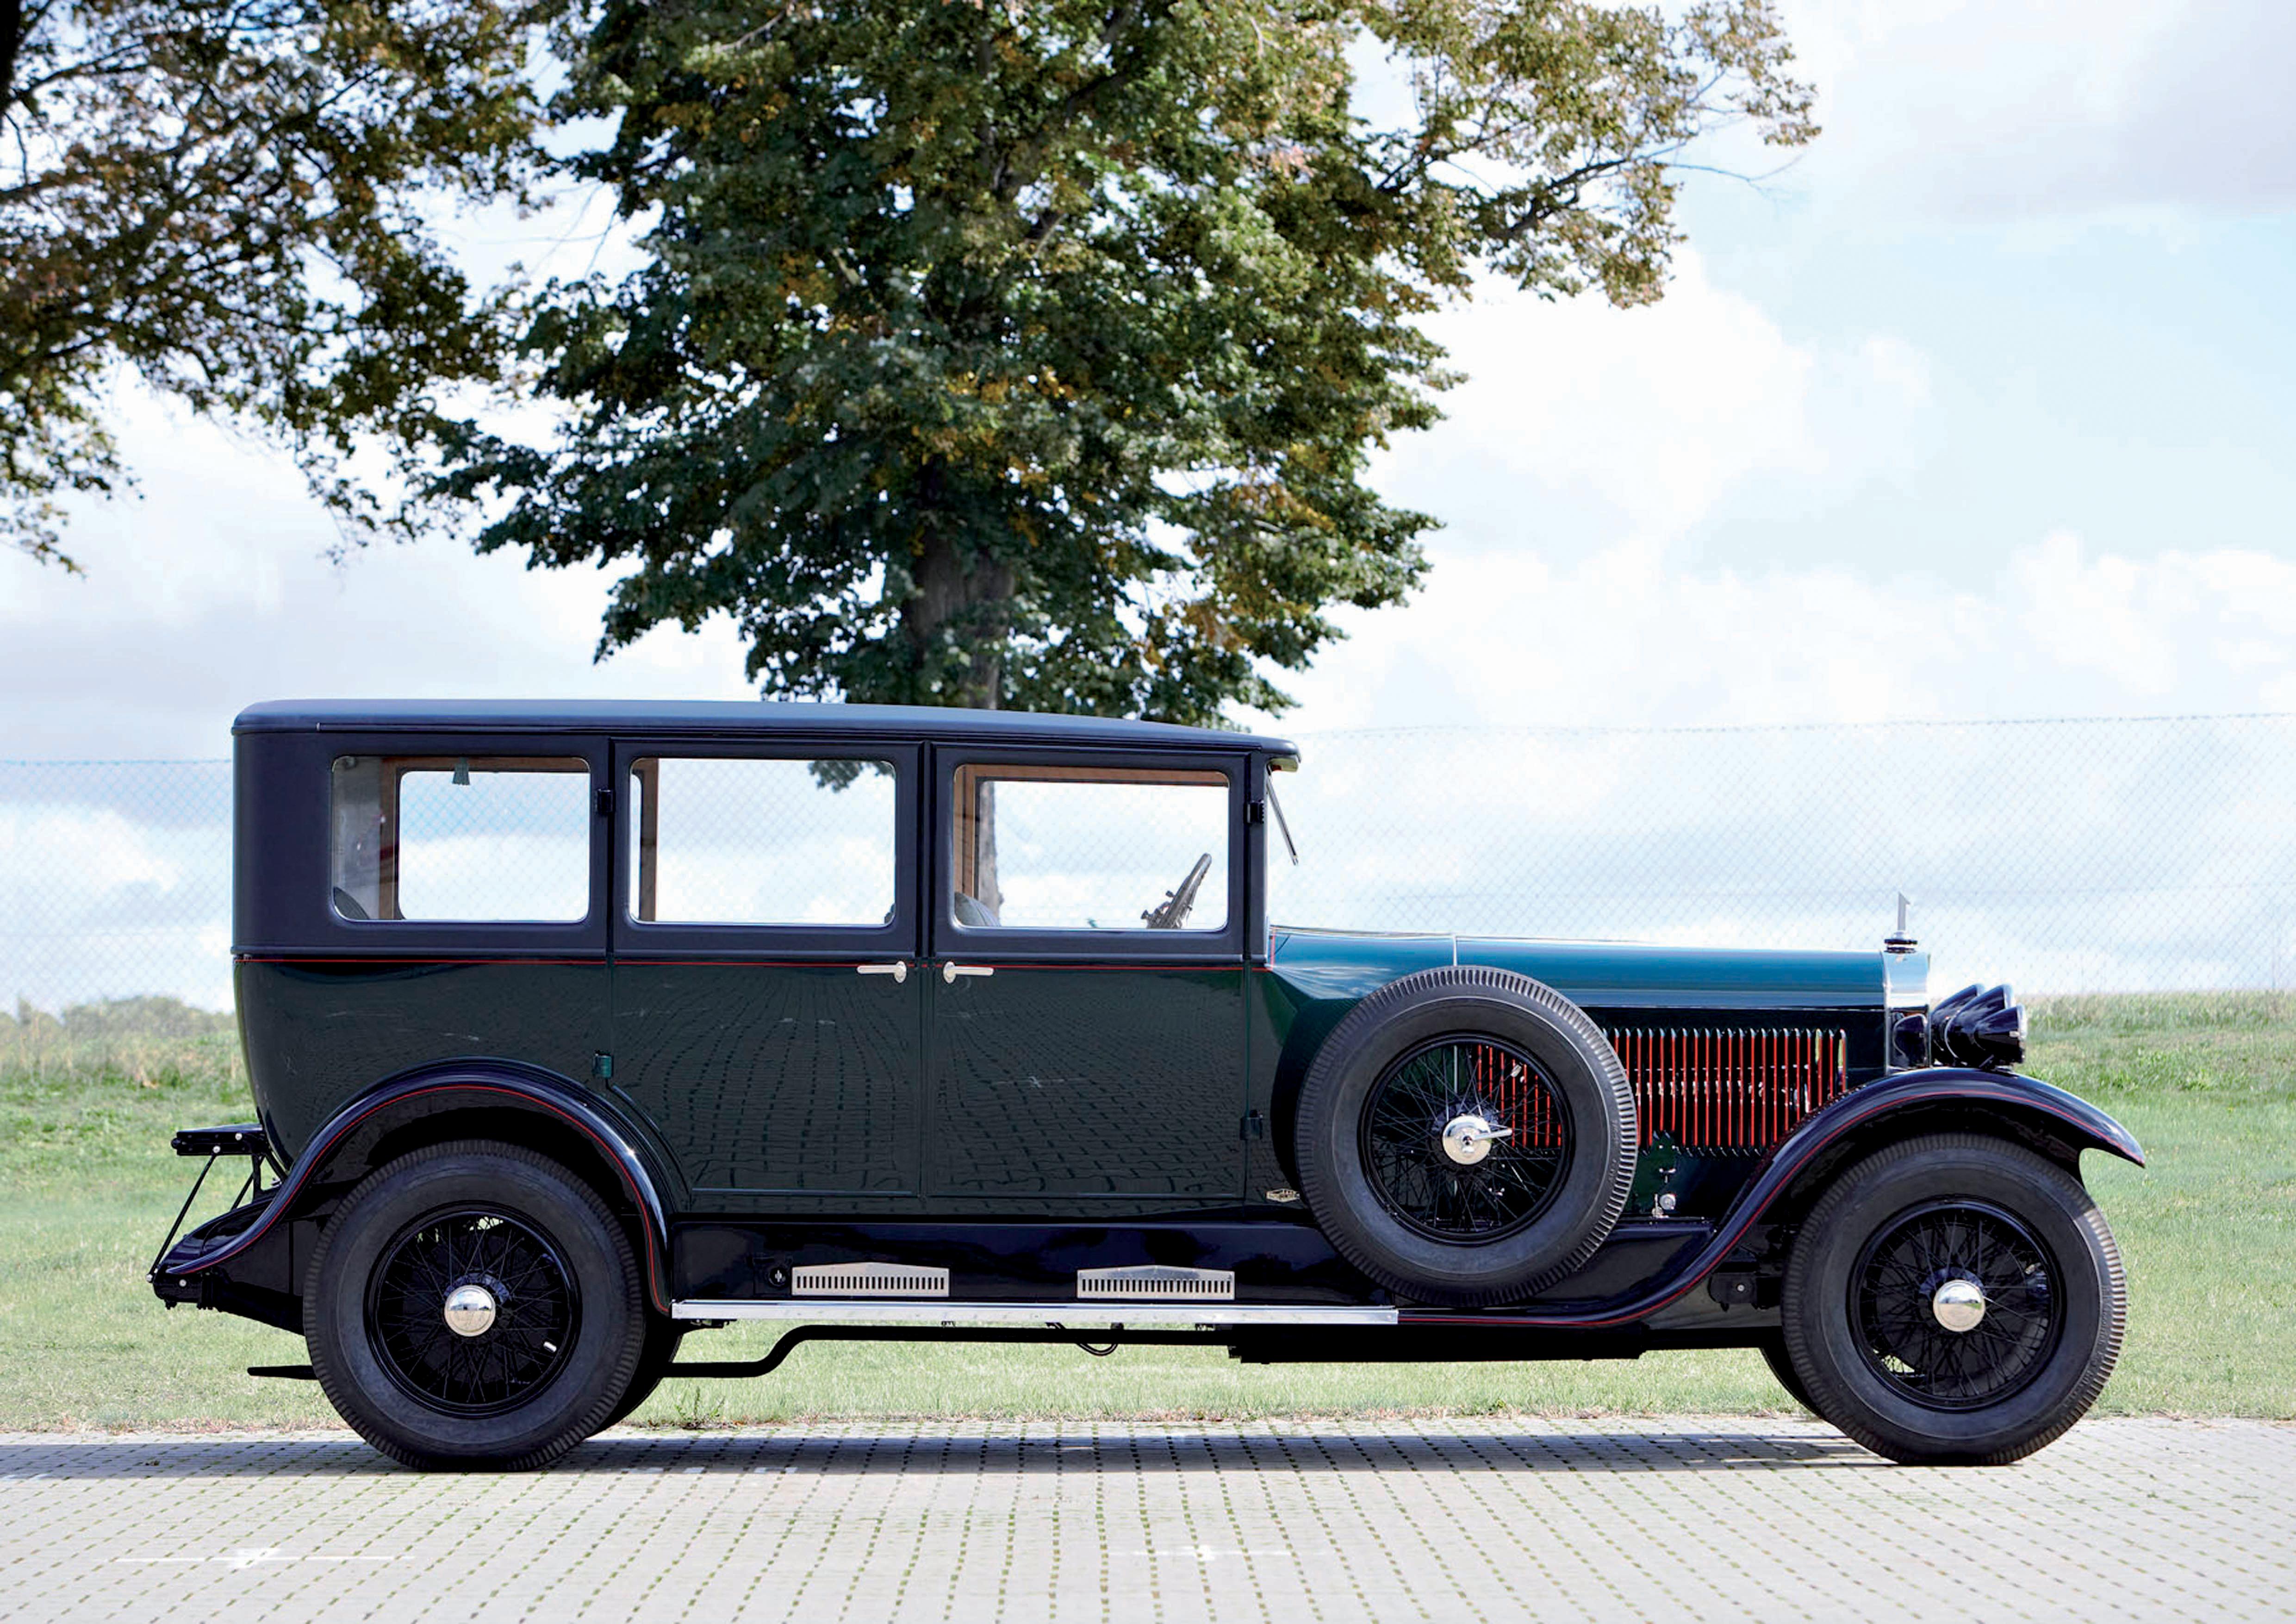 Erster Audi Sechszylinder als Schnittmodell